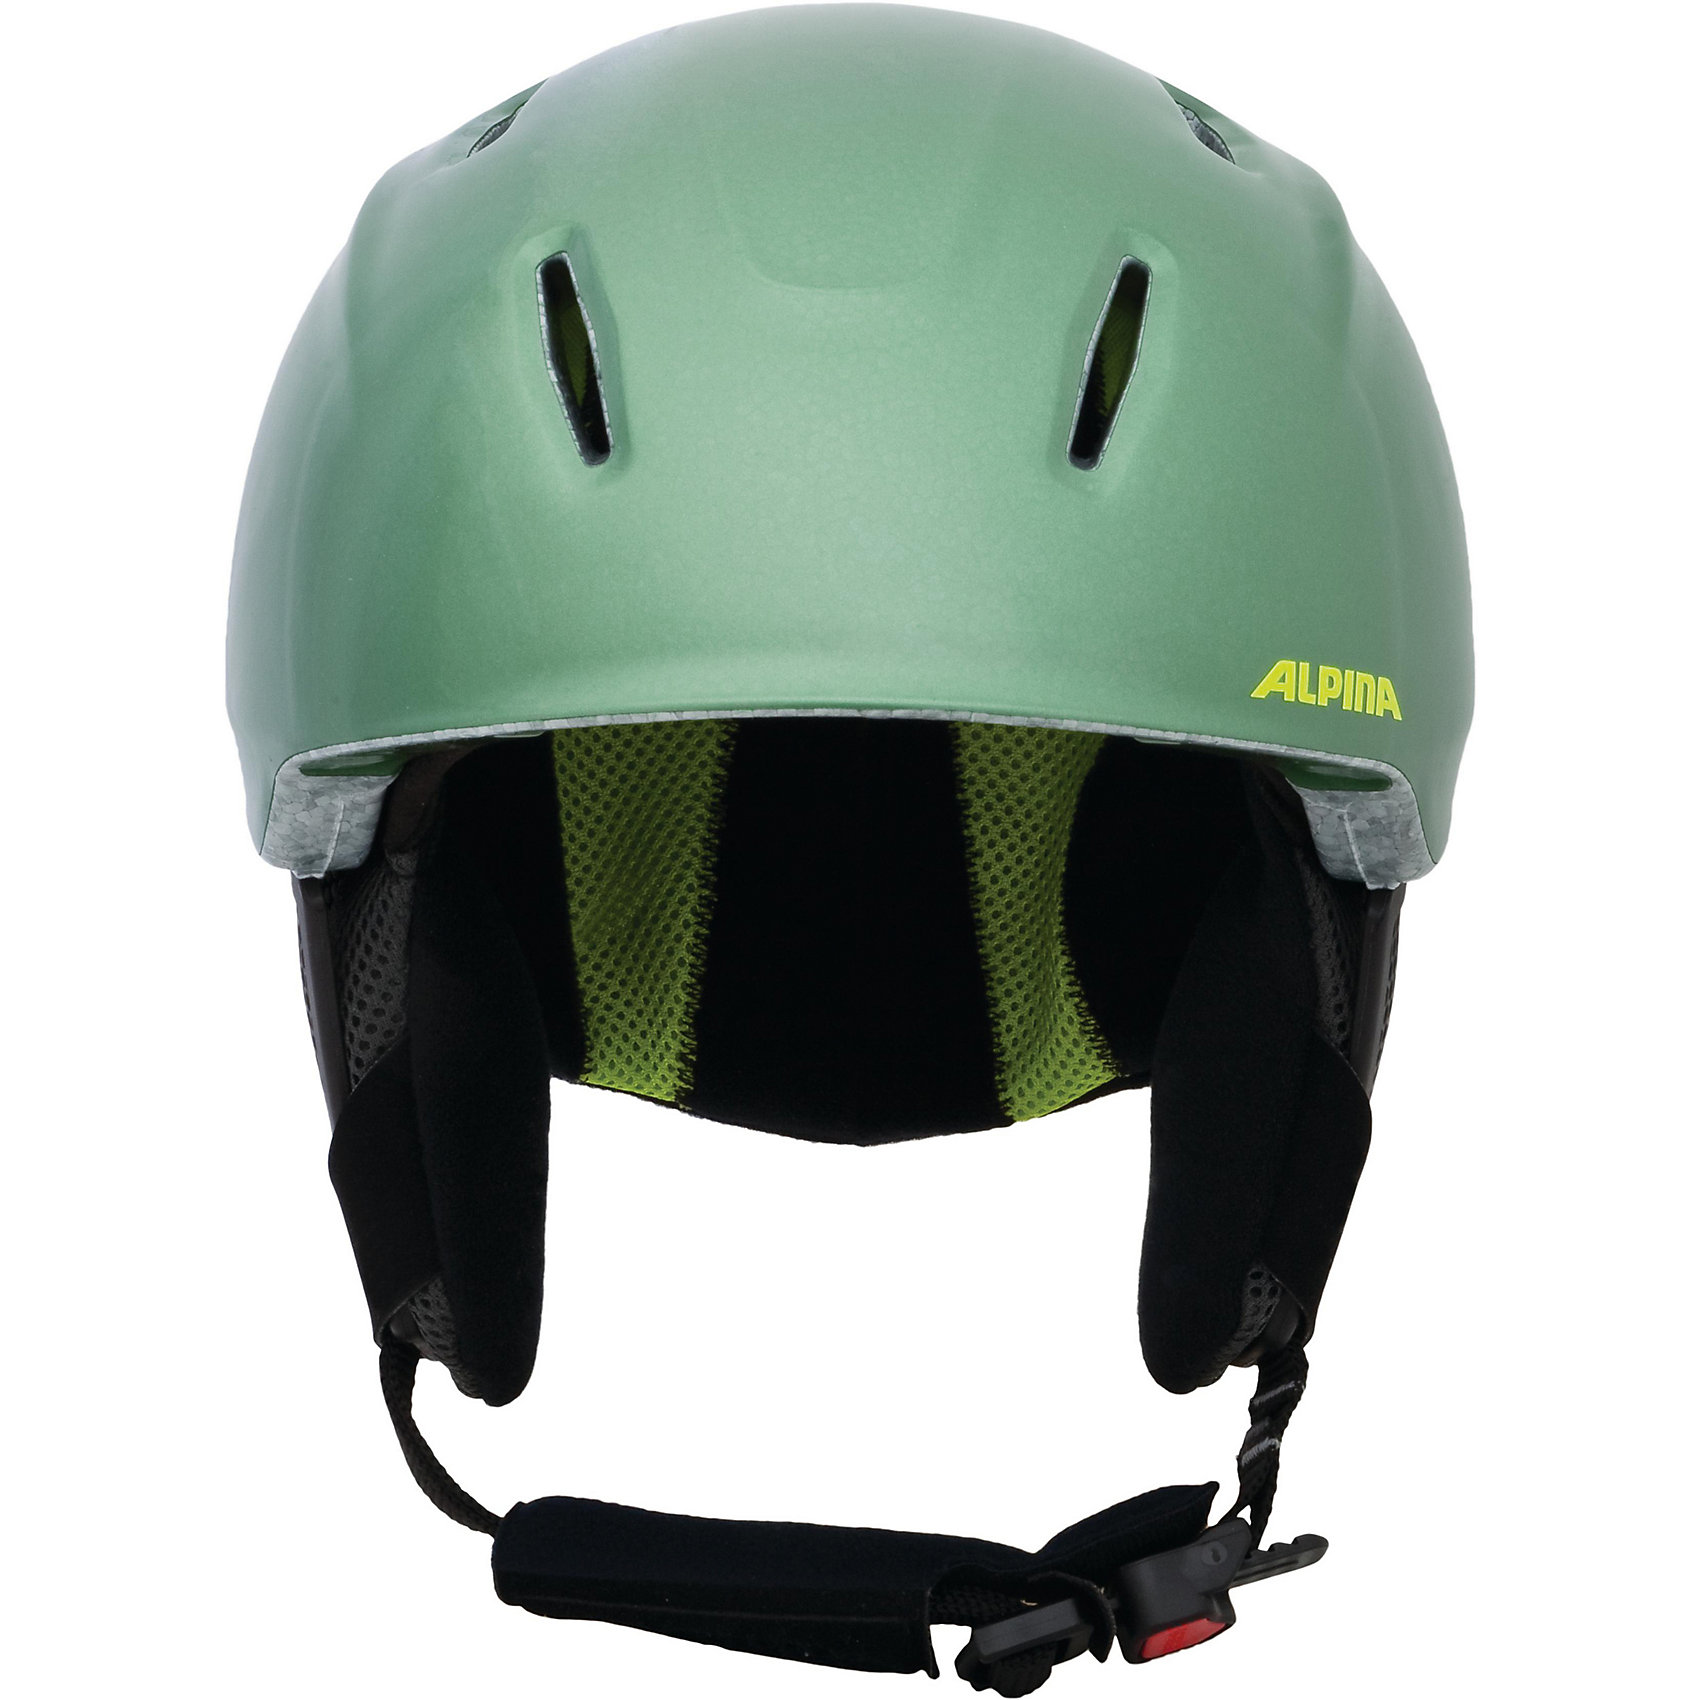 Neu ALPINA Skihelm Carat LX moos-Grün 54-58 8541702 8541702 8541702 grün c357b8